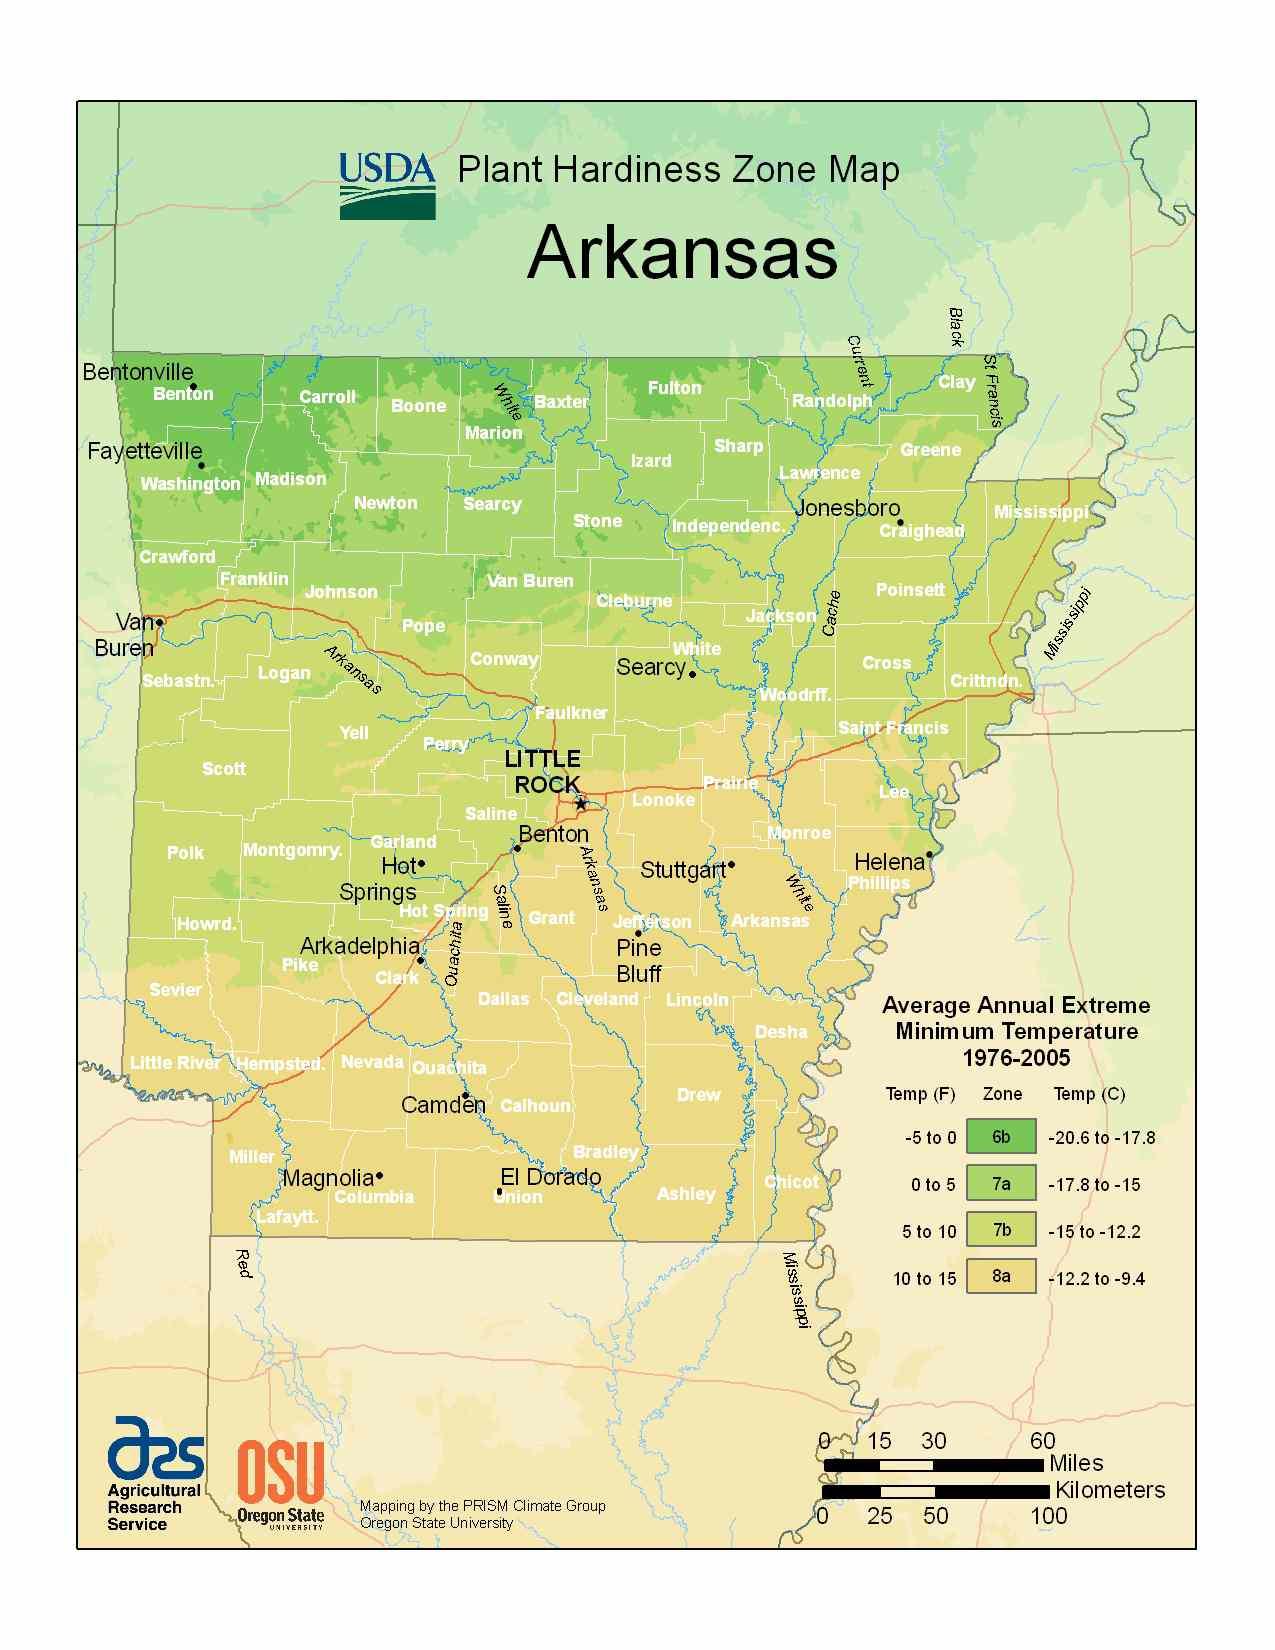 Photo of the Arkansas Hardiness Zones